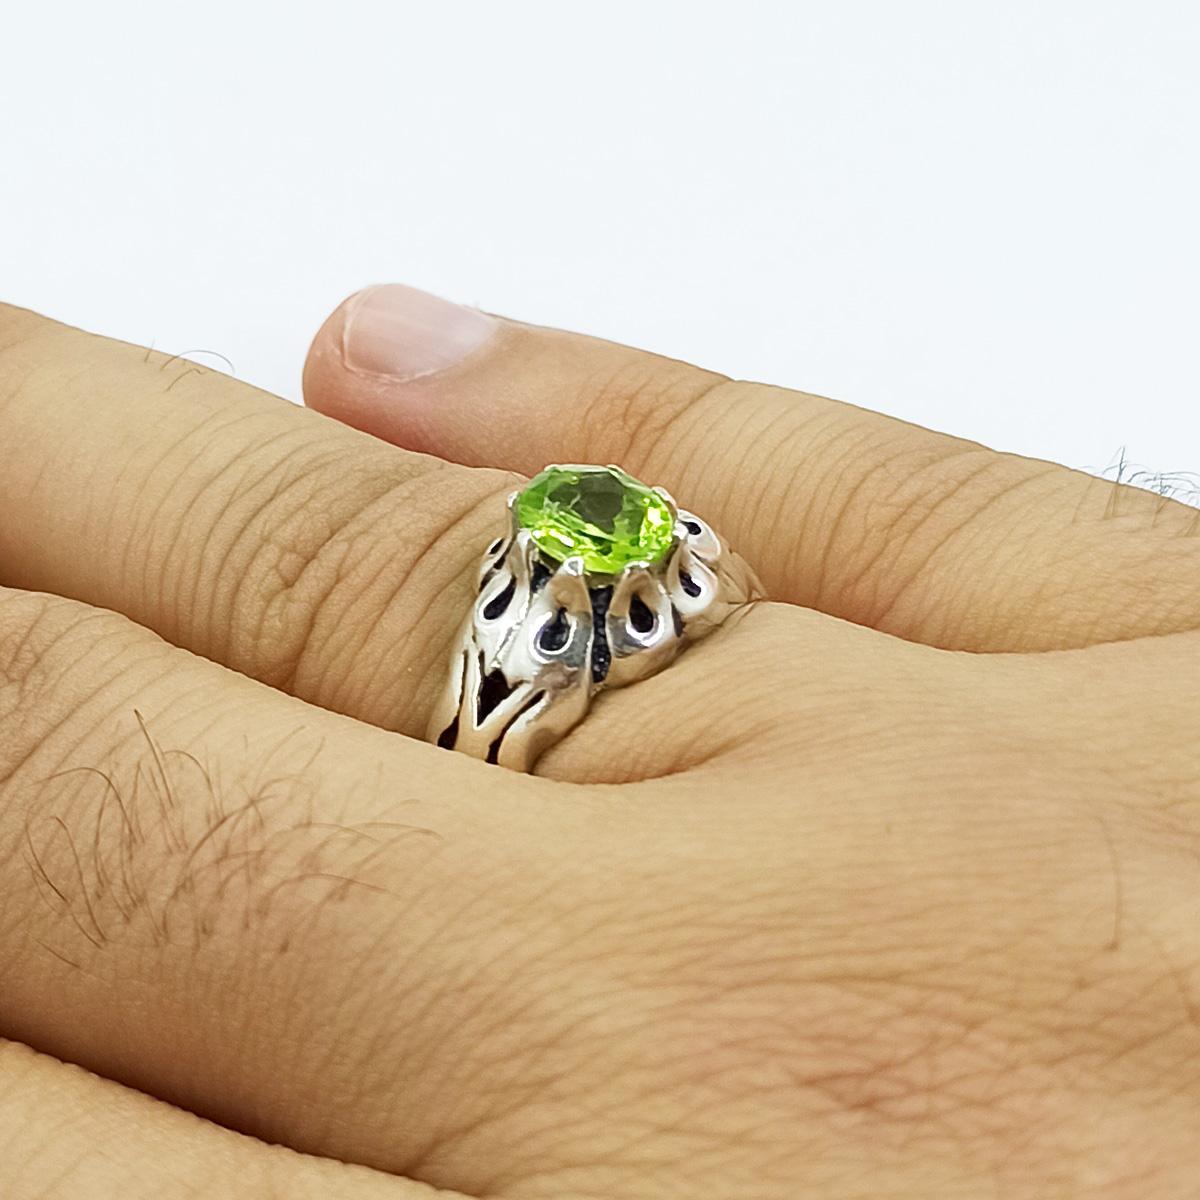 انگشتر نقره مردانه سلین کالا مدل زبرجد ce-As175